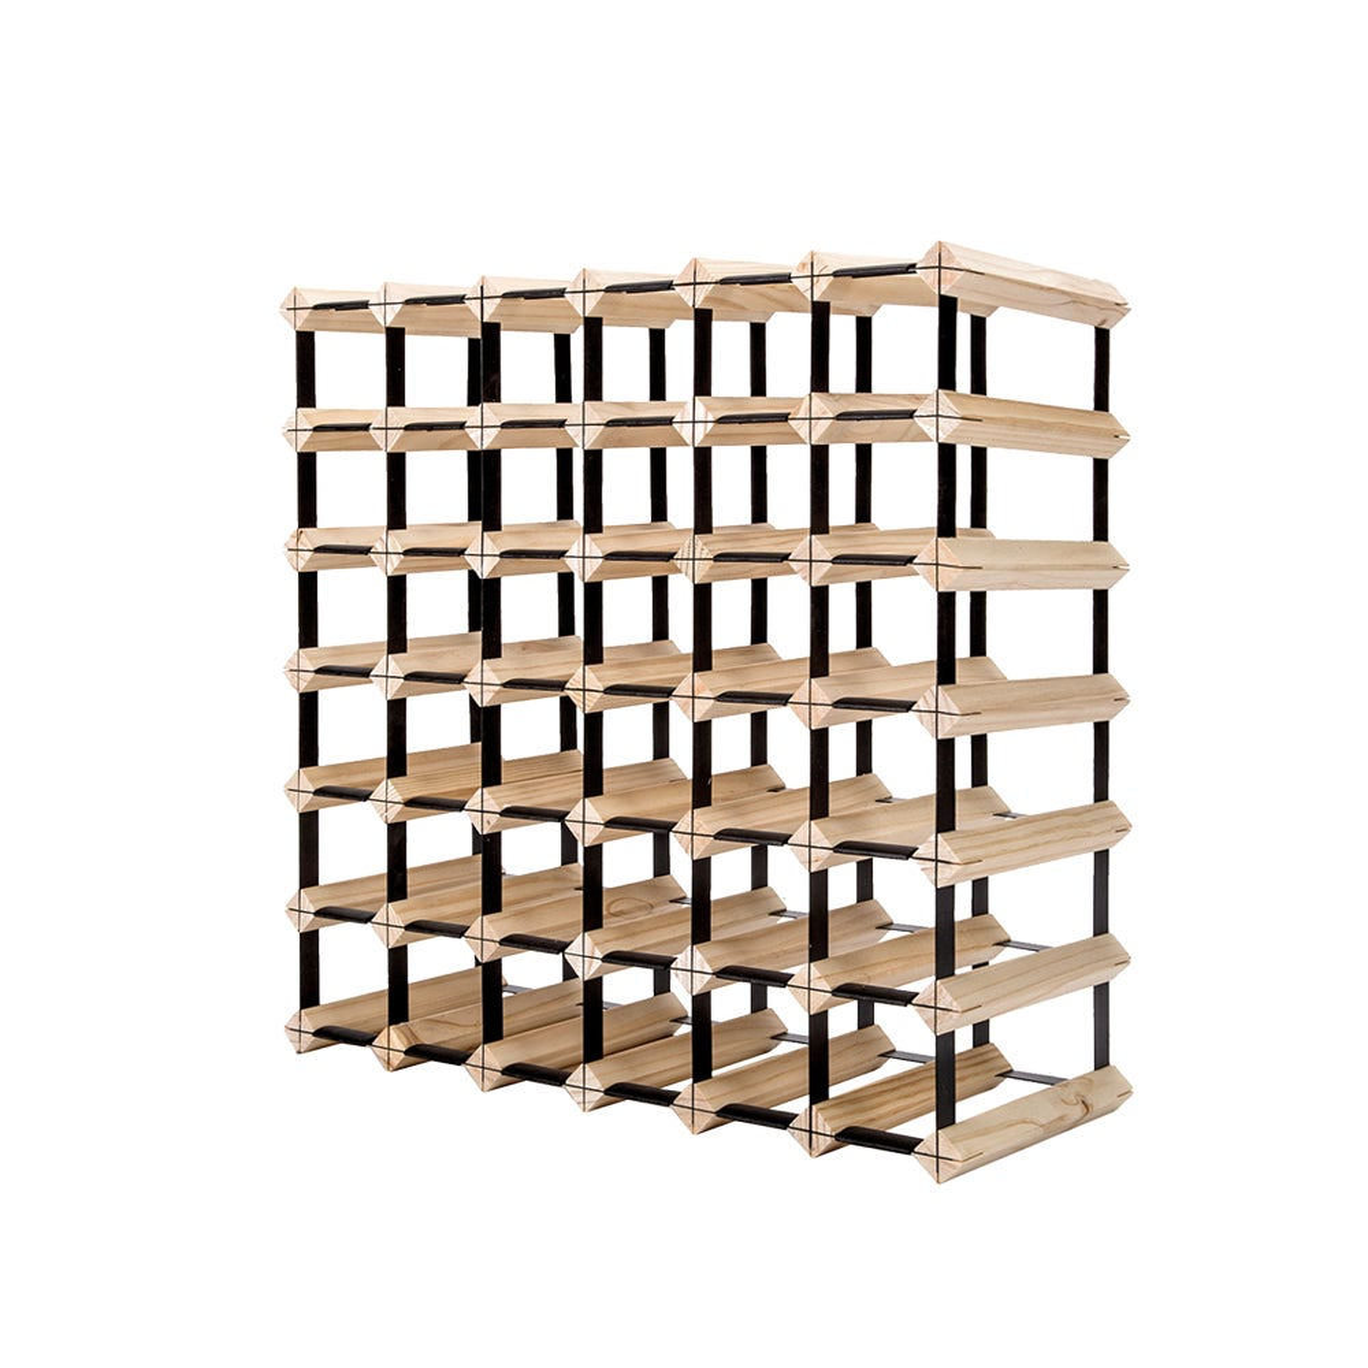 Glasshaus 42 Bottle Timber Wine Rack Wooden Storage System Cellar Organiser